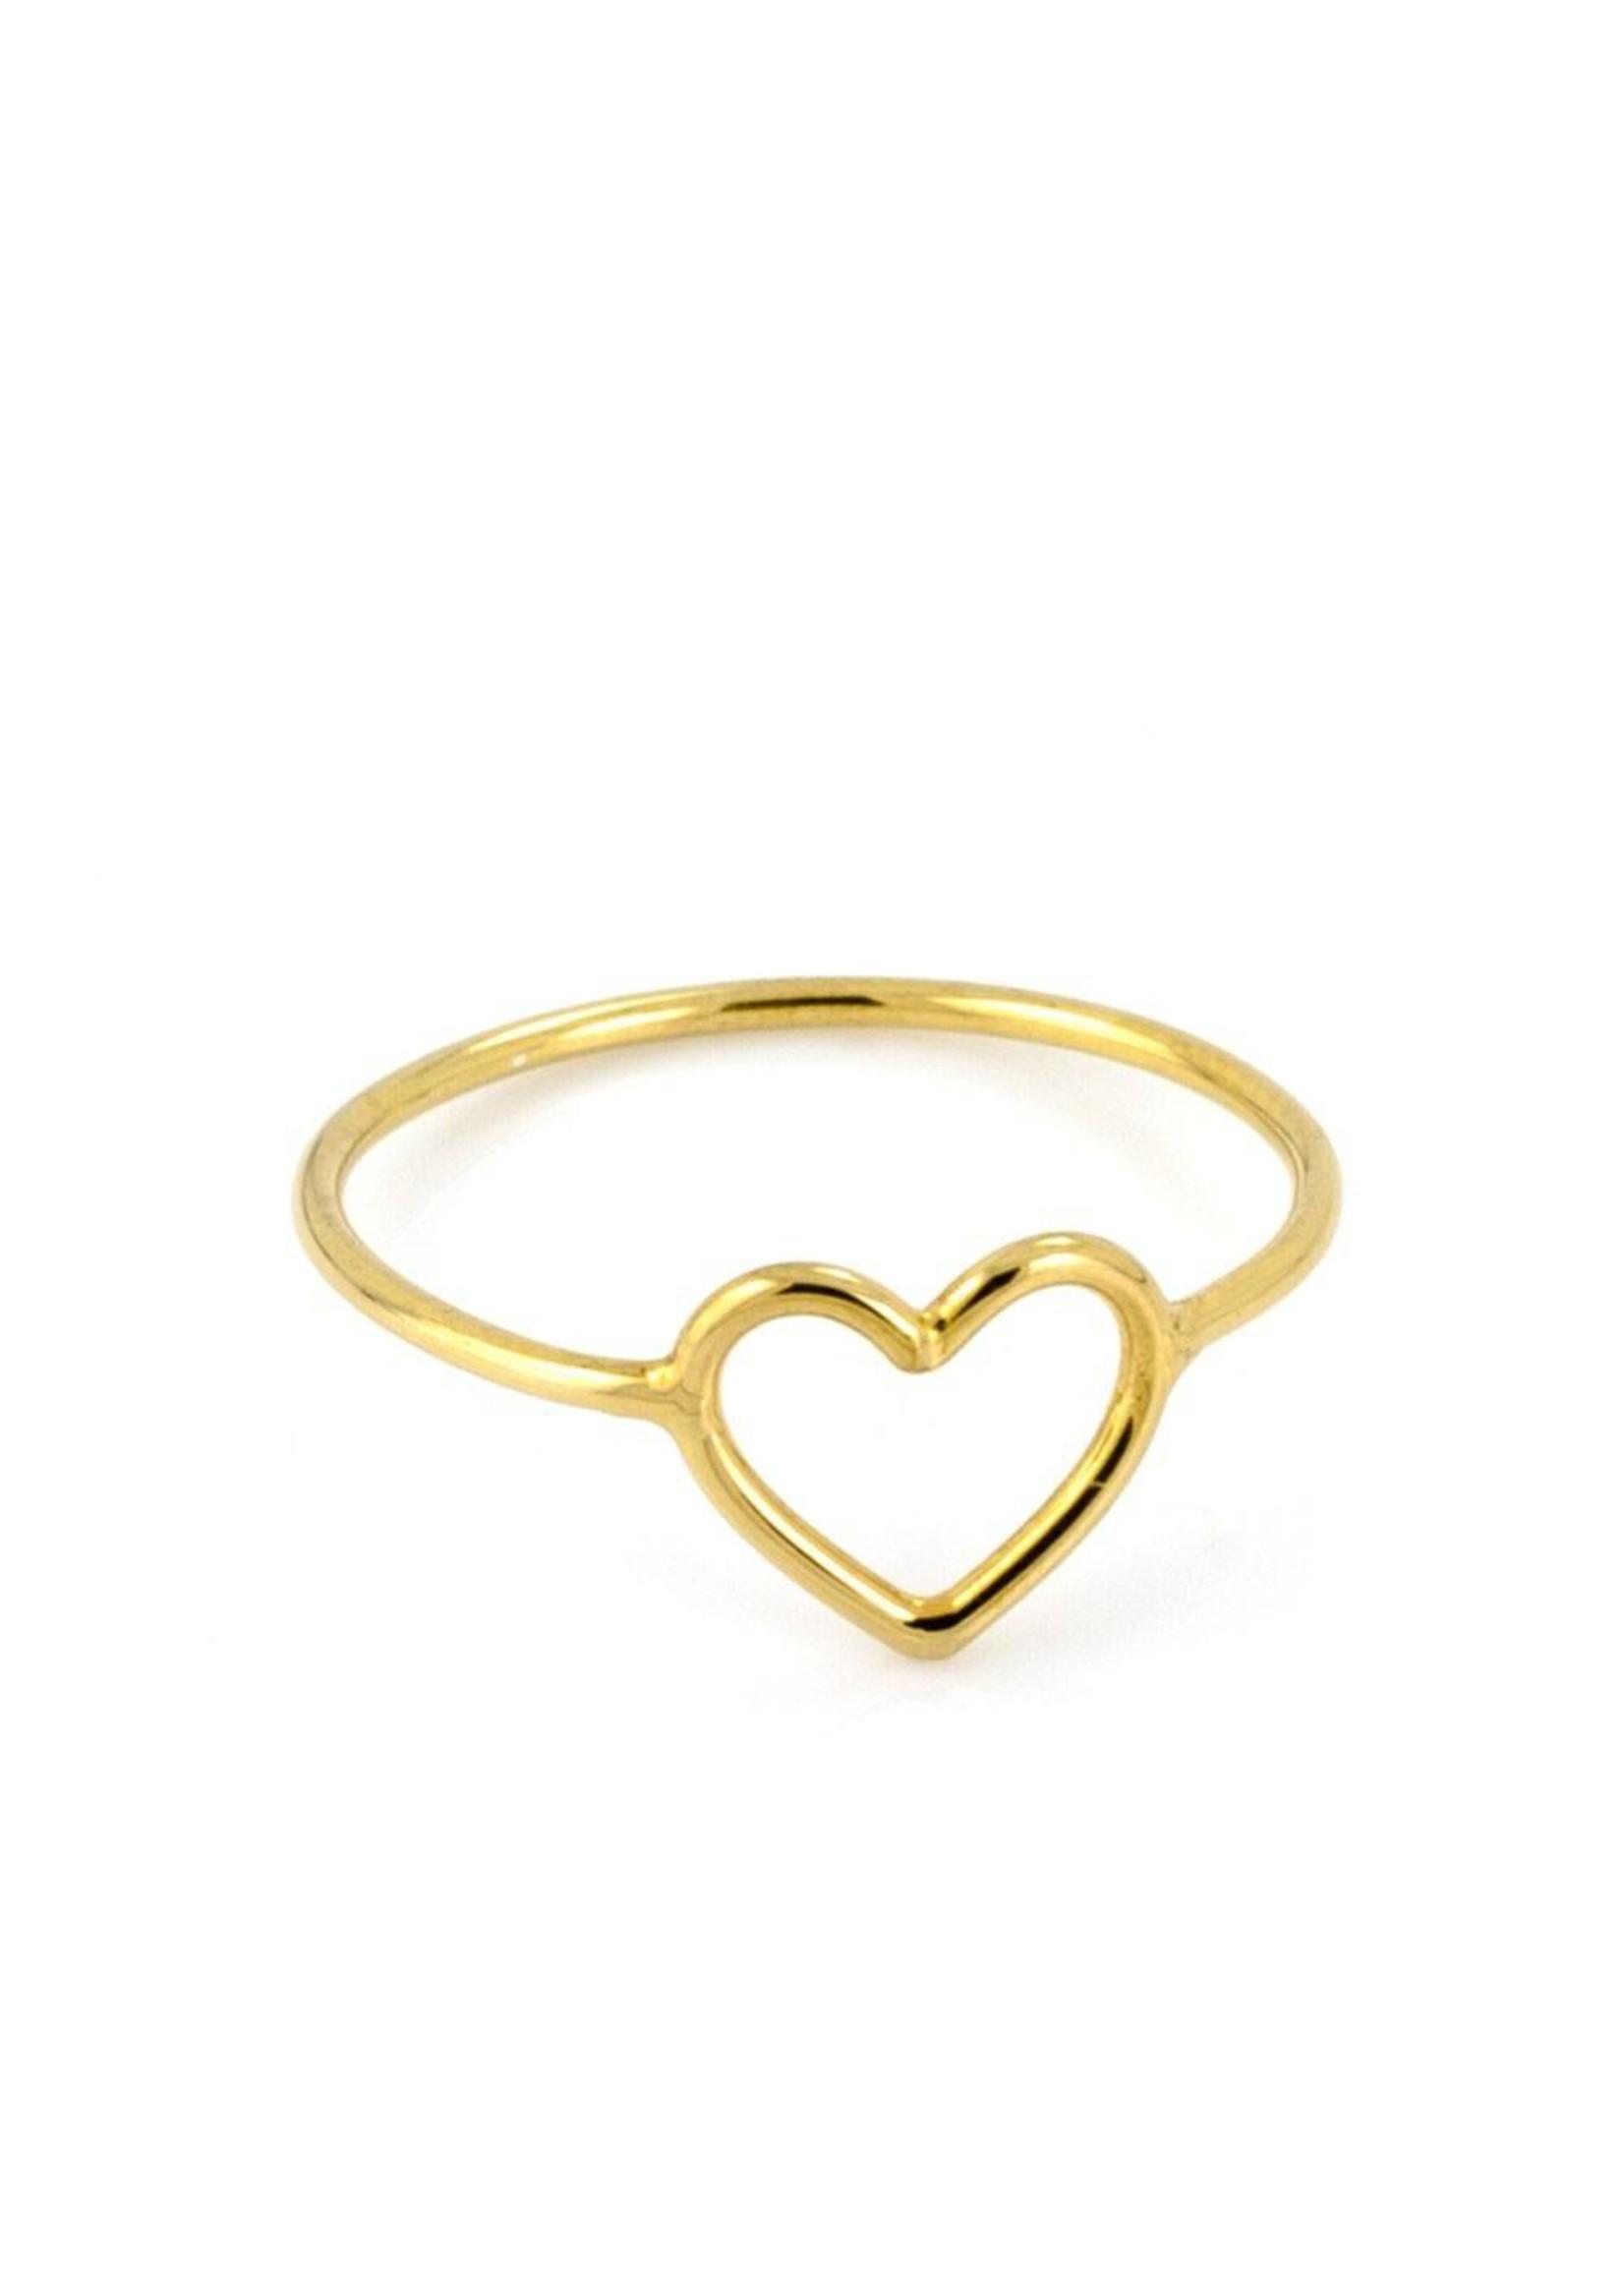 Laura Gravestock Laura Gravestock Written Tiny Heart Ring - 18ct Gold Plated Silver